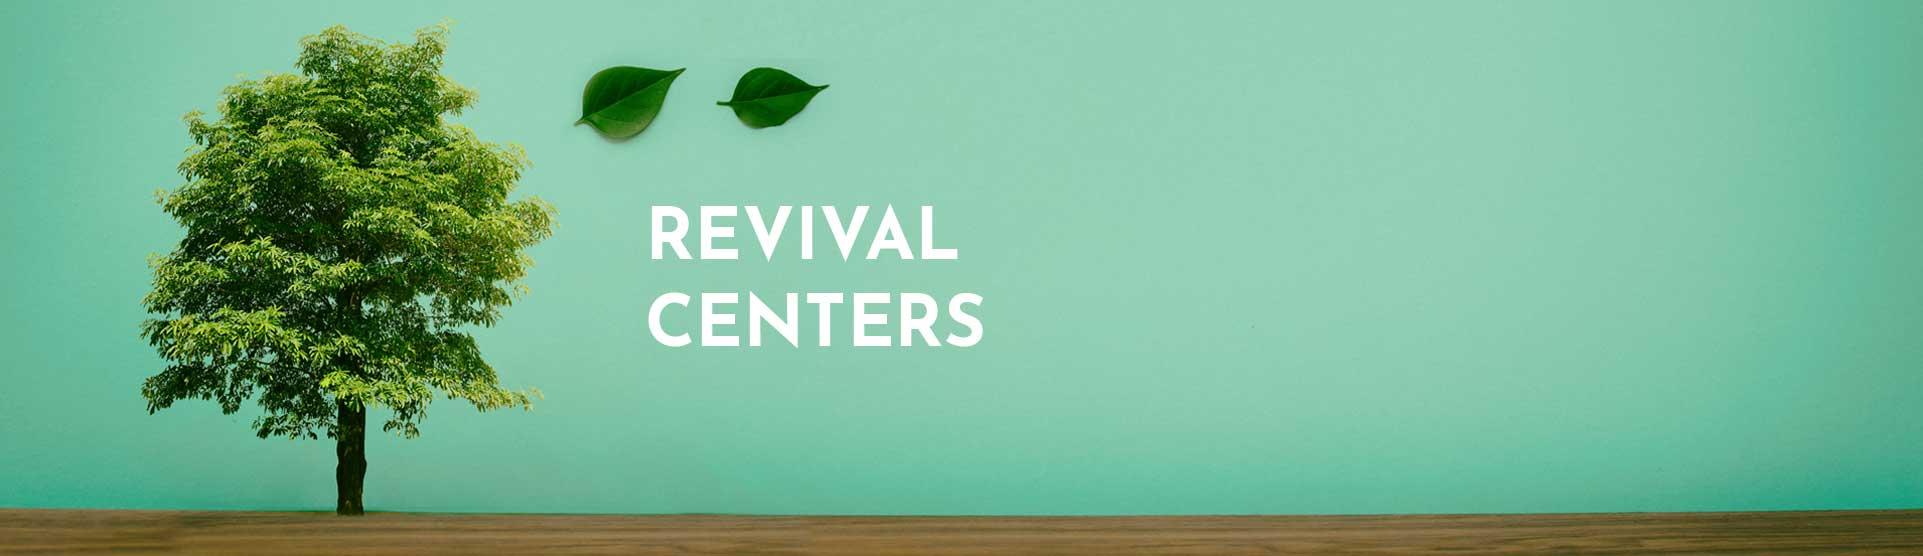 Revival centers